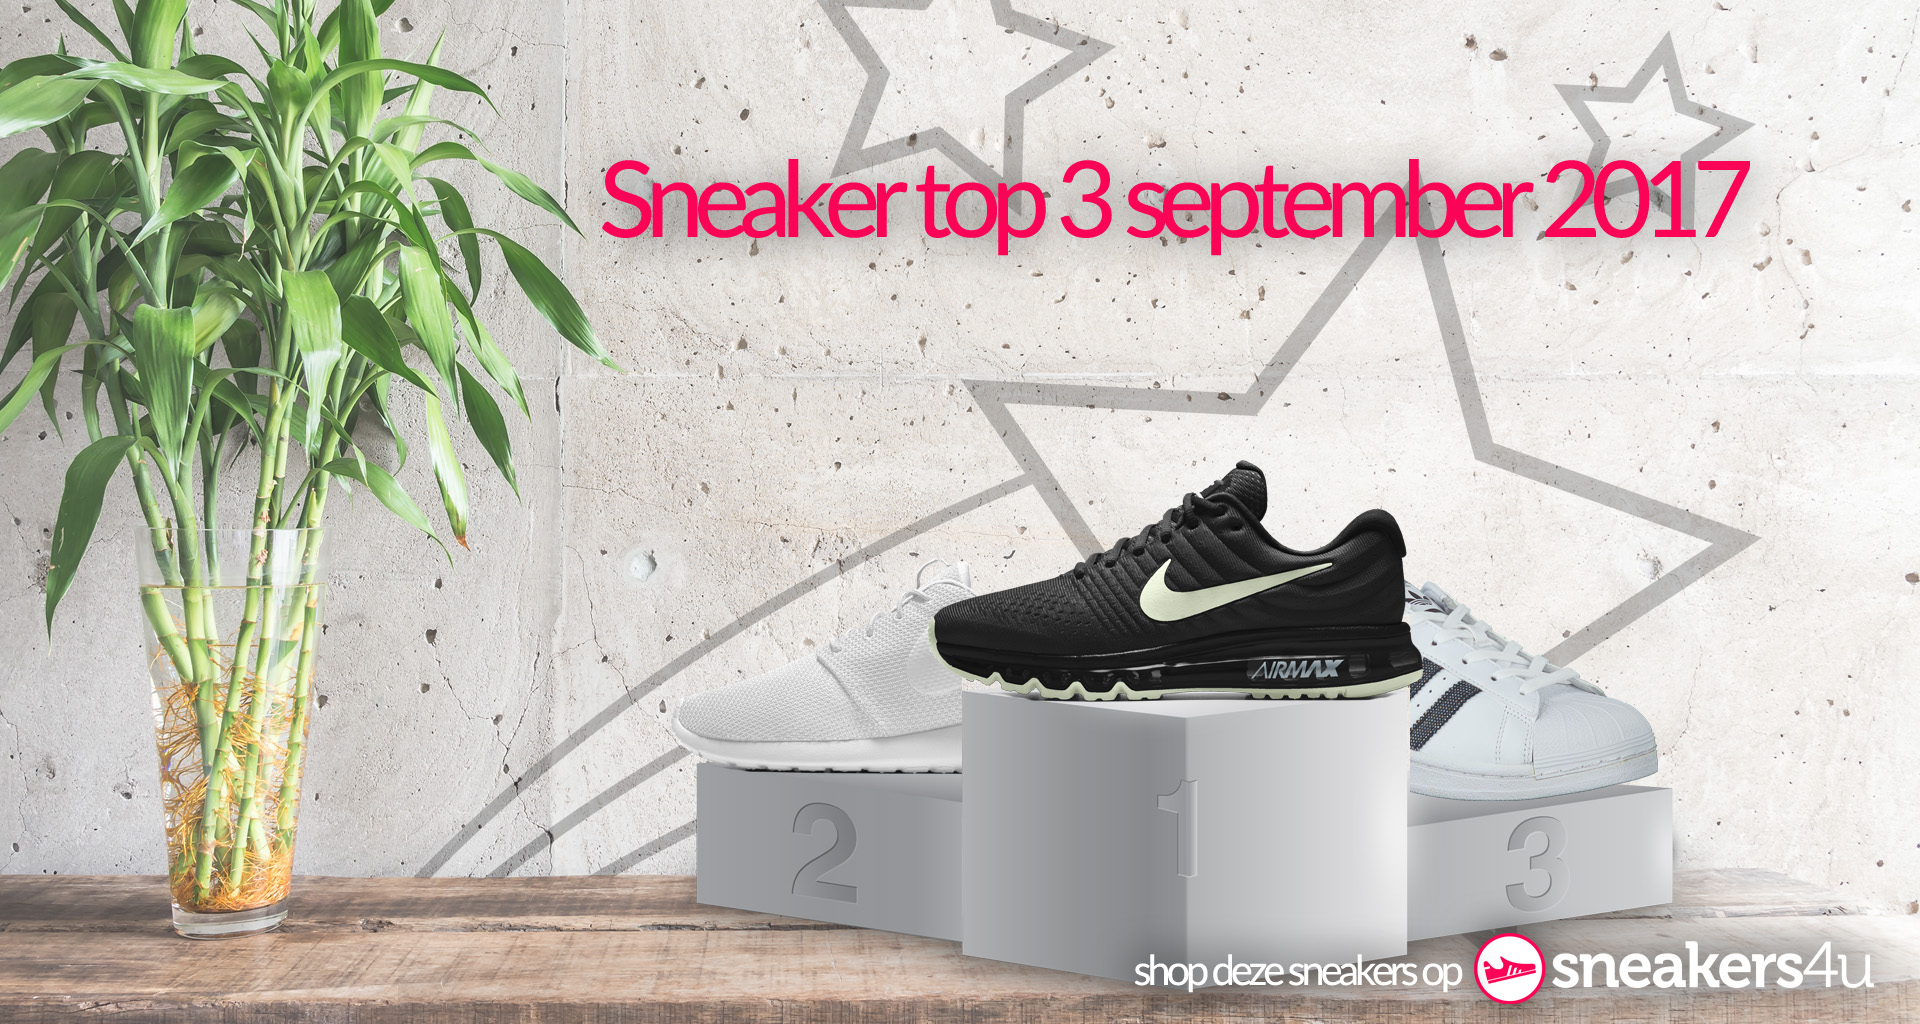 Sneaker top 3 2017